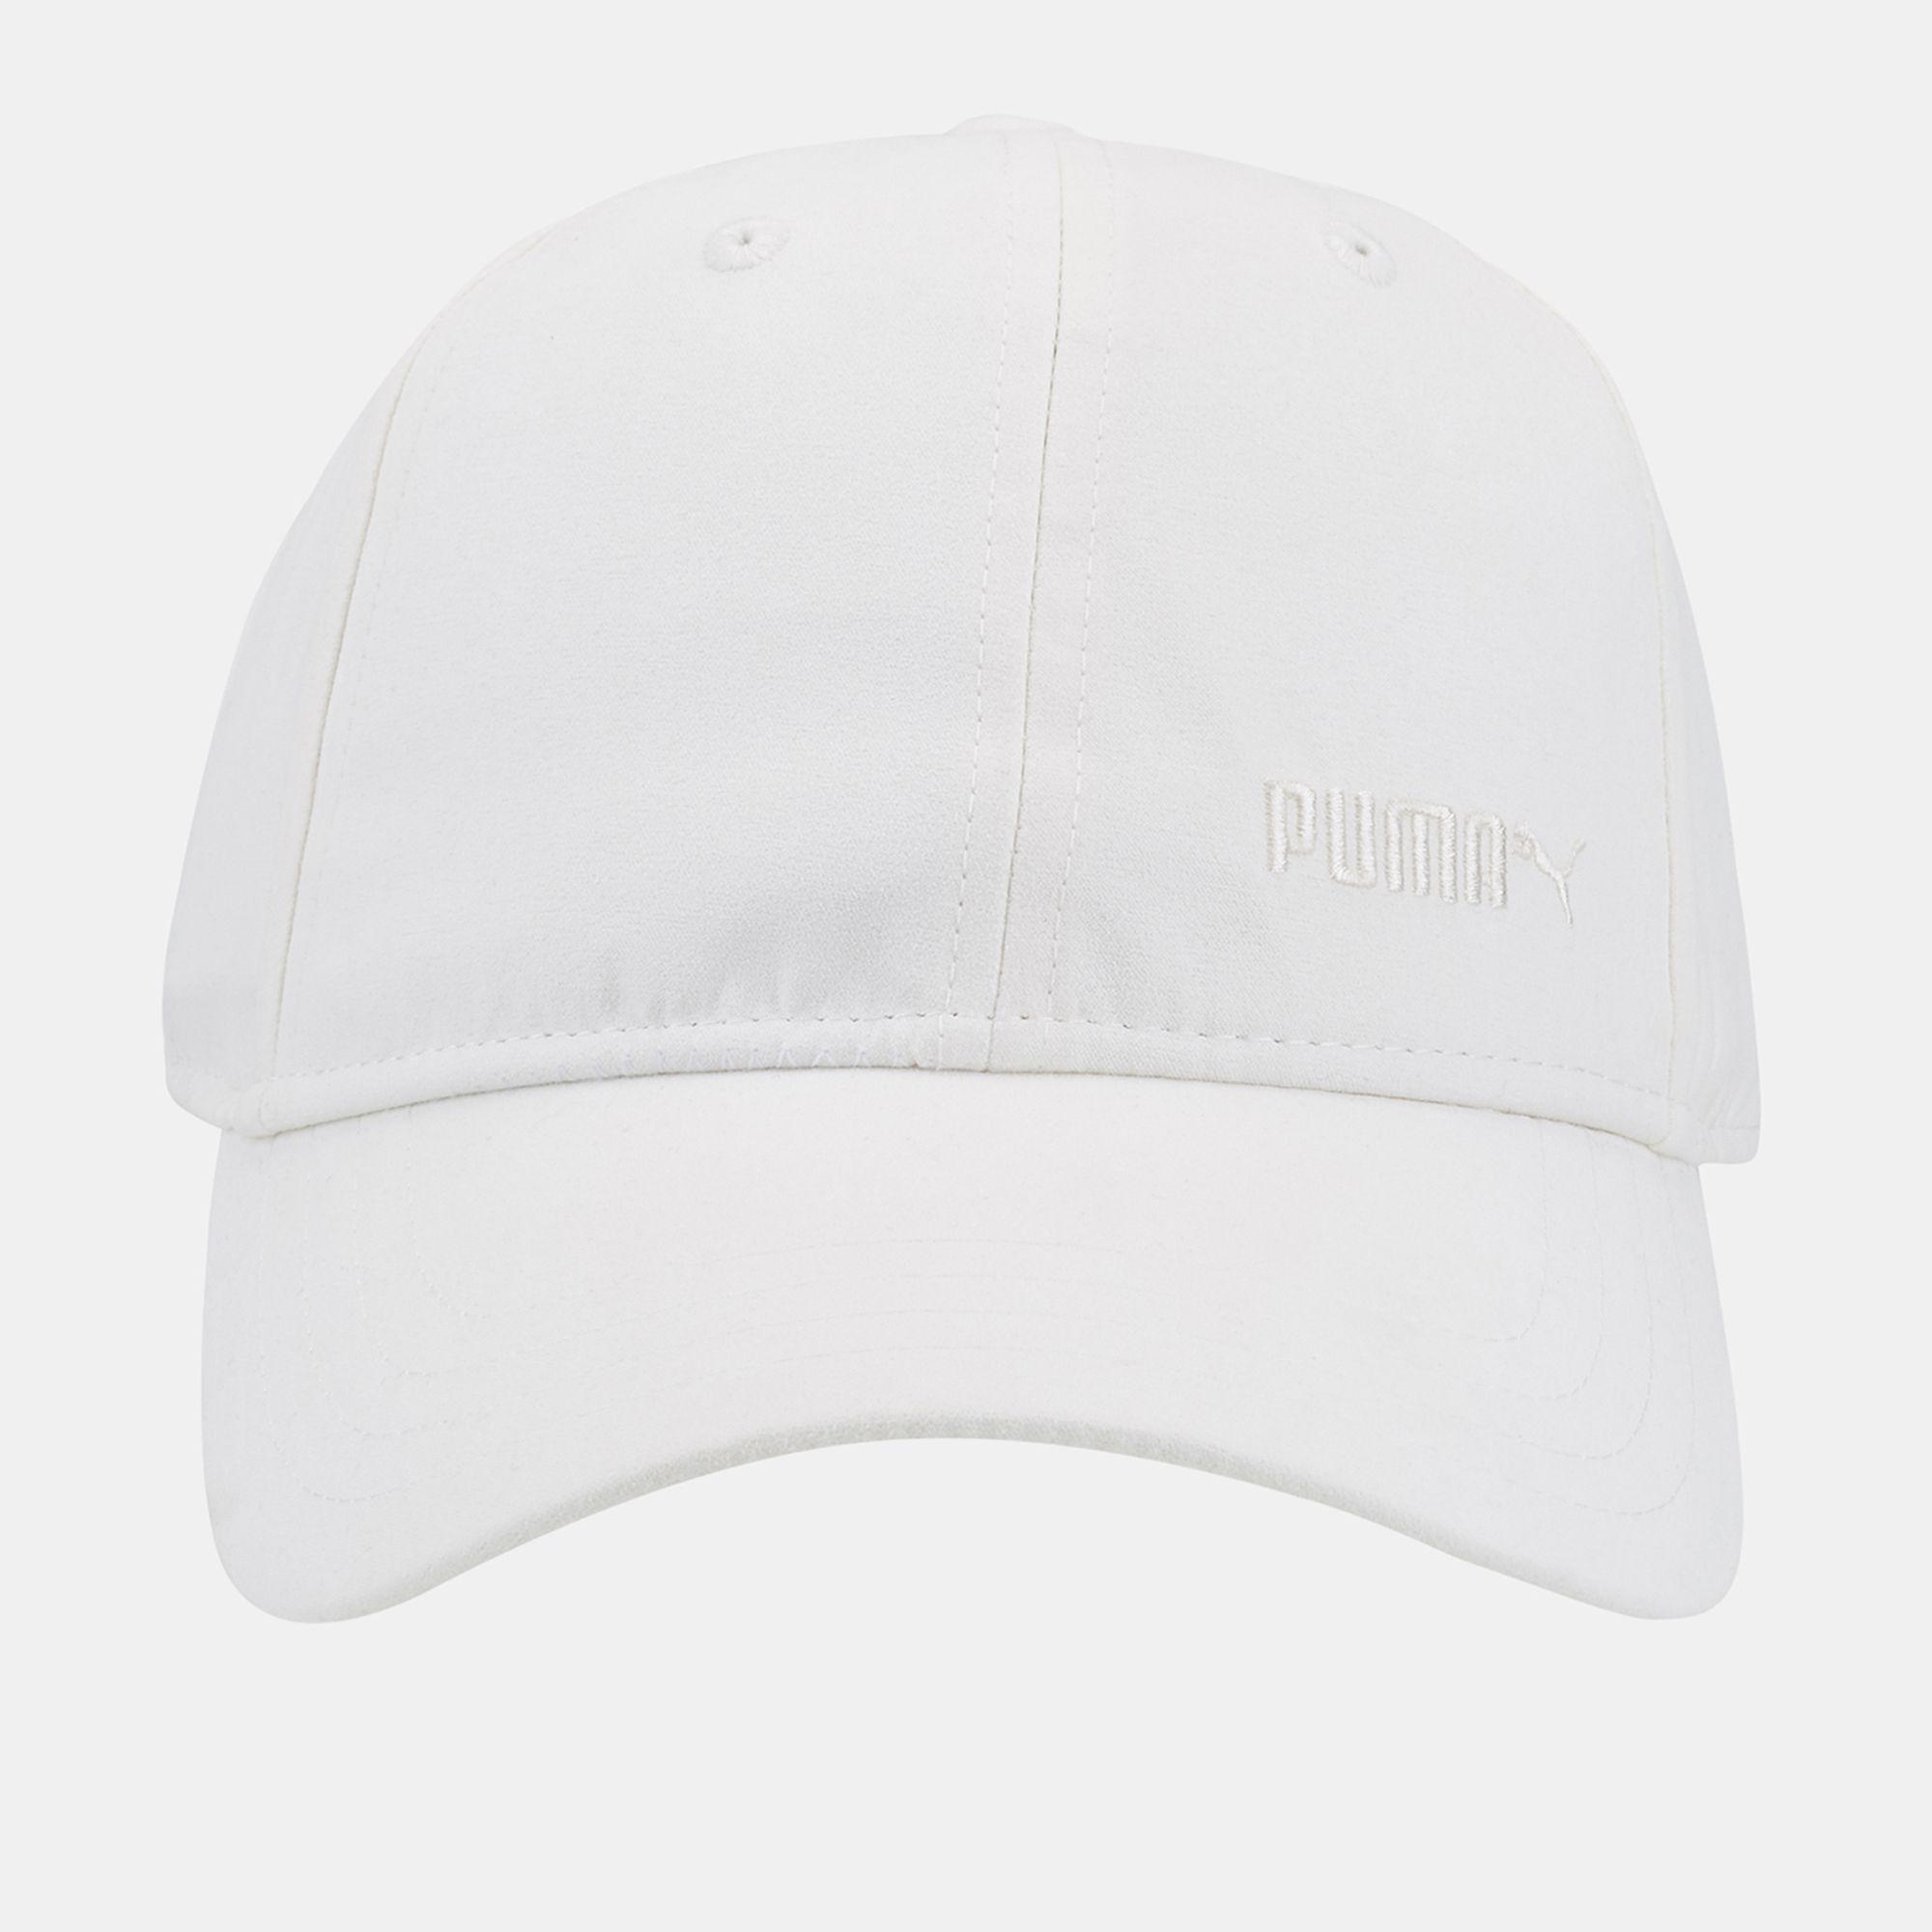 PUMA Bow Cap - White 9ecaa34be0c